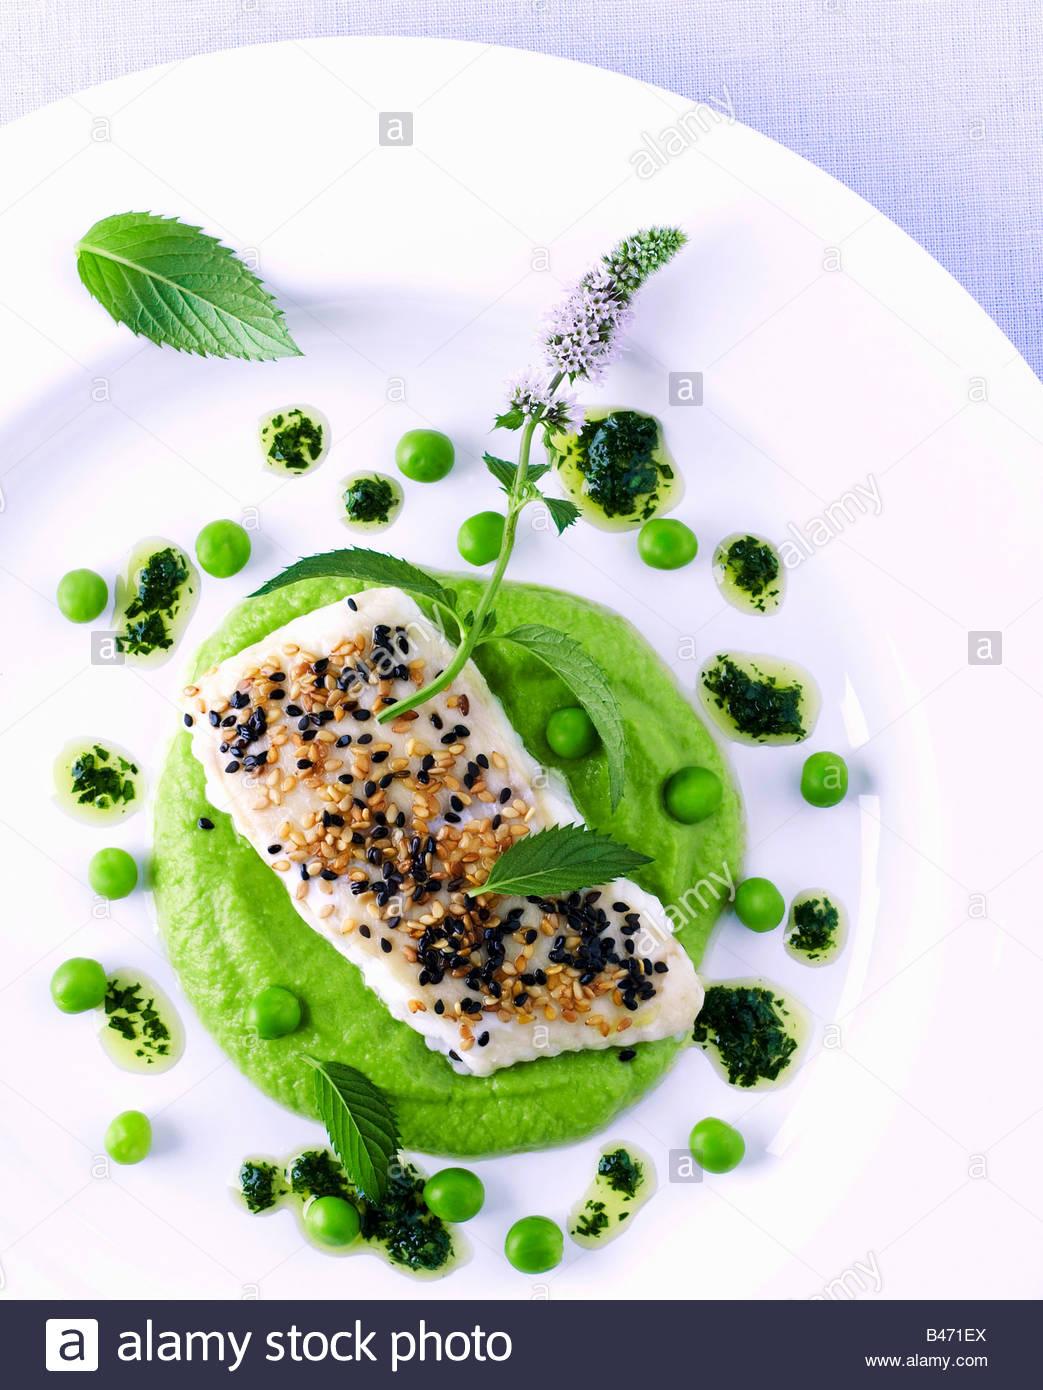 Filete de pescado con sésamo sobre puré de guisantes y vinagreta de limón Imagen De Stock